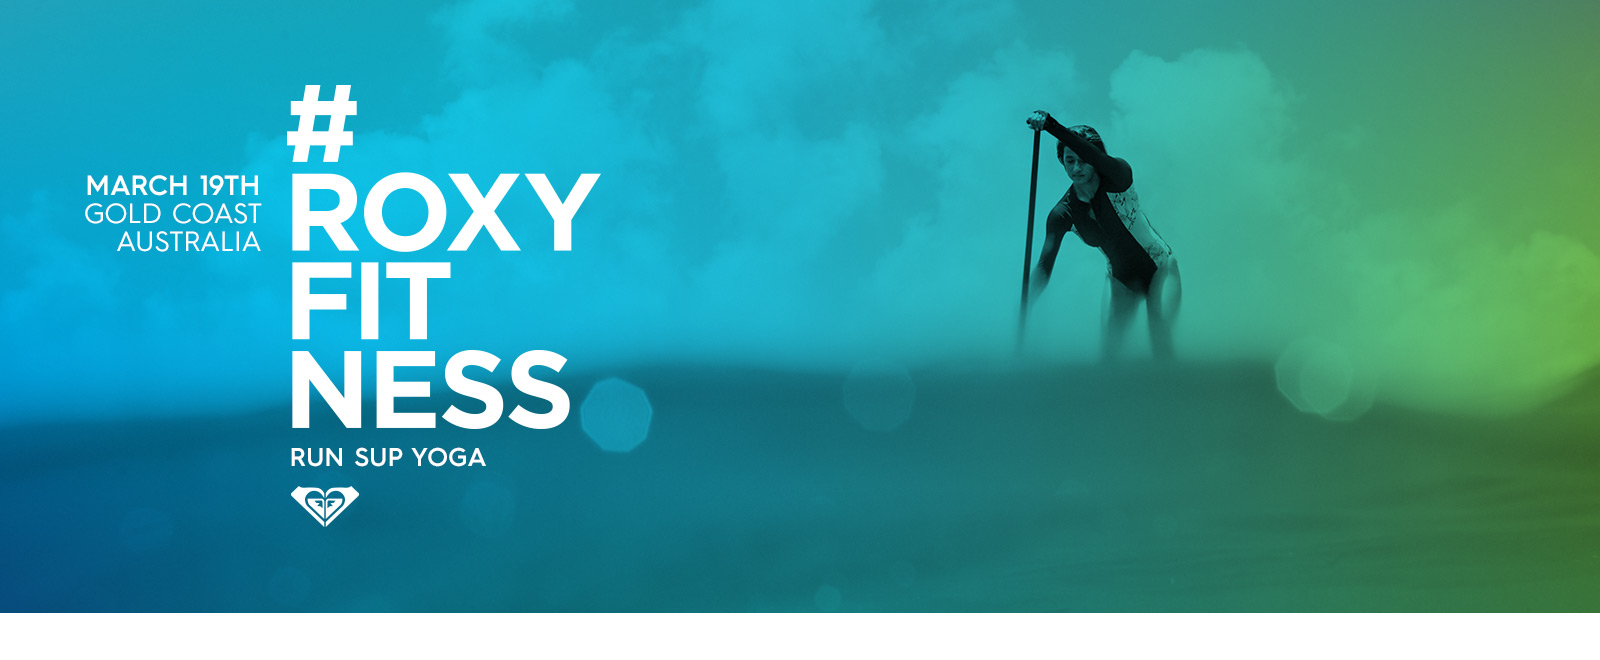 Women's fitness in Gold Coast, Australia #ROXYFITNESS | Roxy